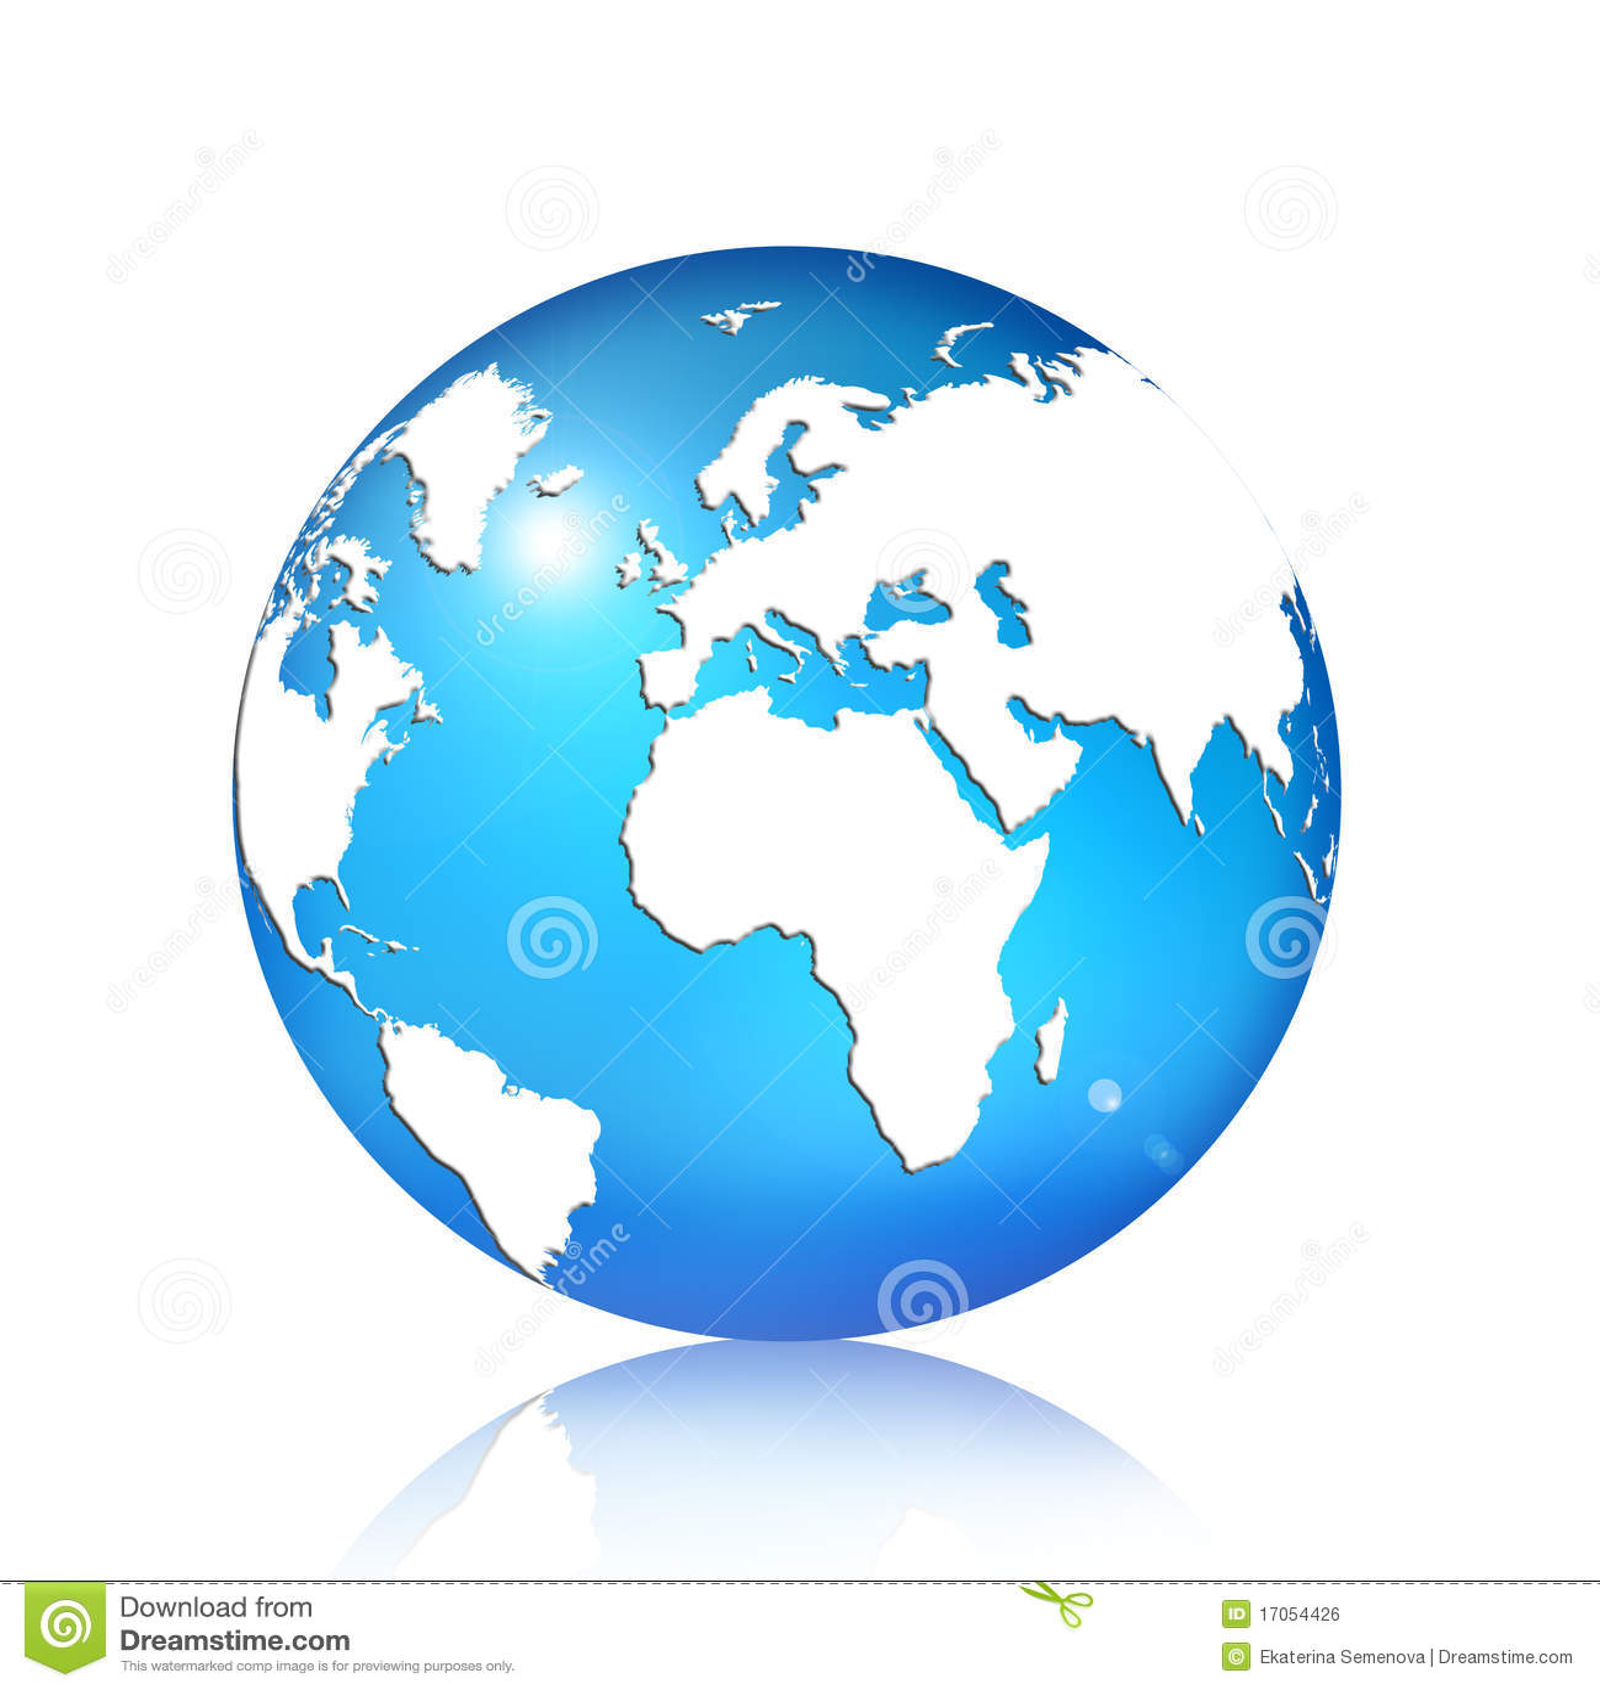 3d背景蓝色地球白色.图片